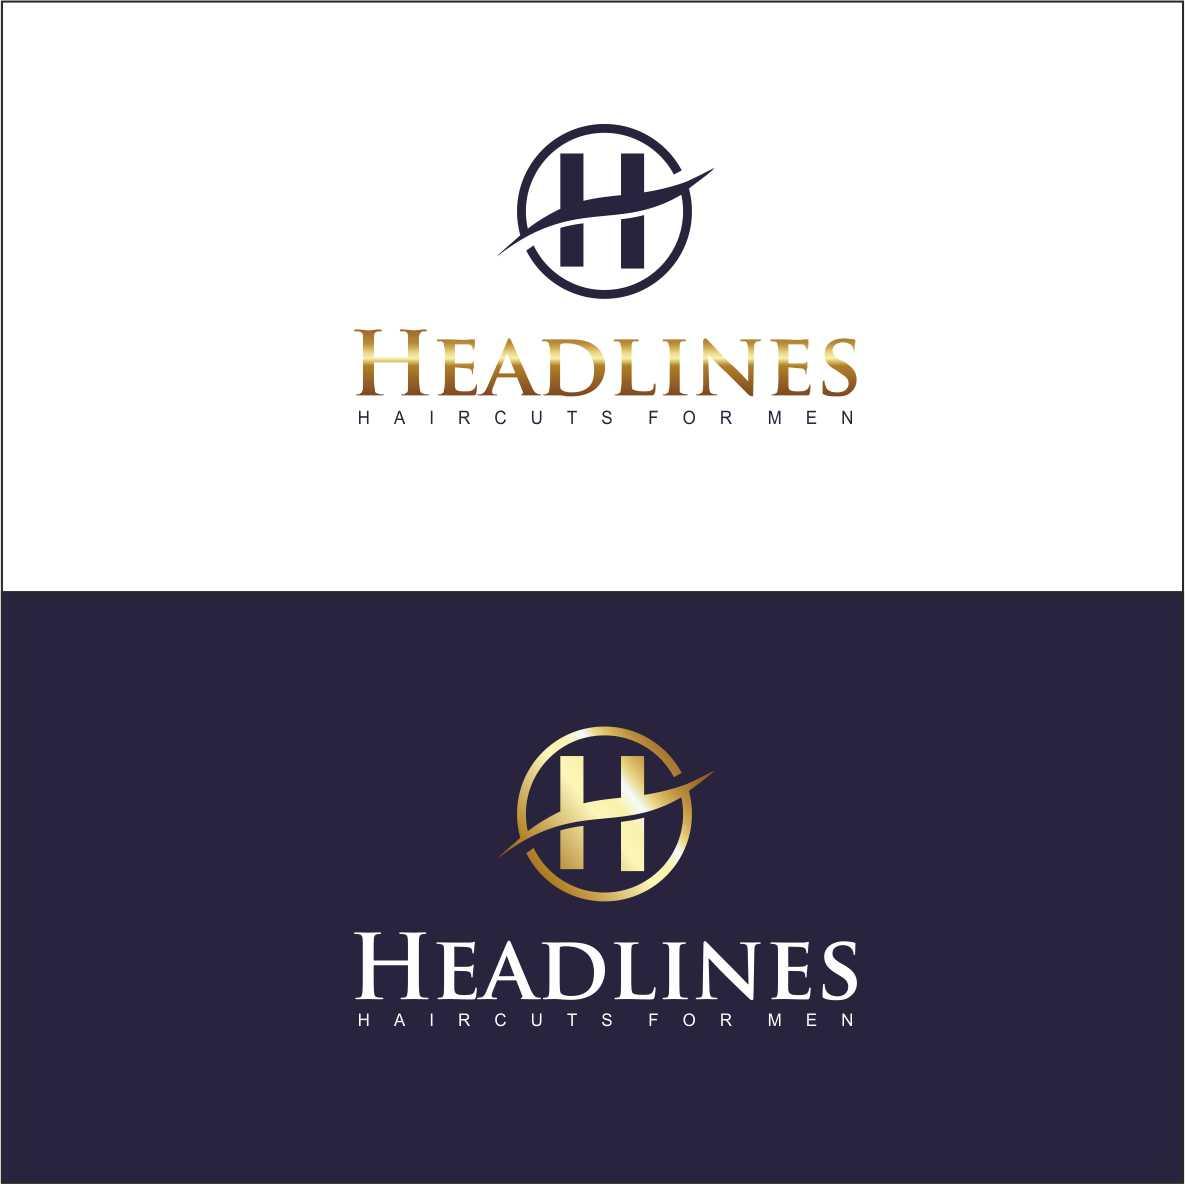 Logo Design by simbol - Entry No. 44 in the Logo Design Contest Headlines Haircuts For Men Logo Design.